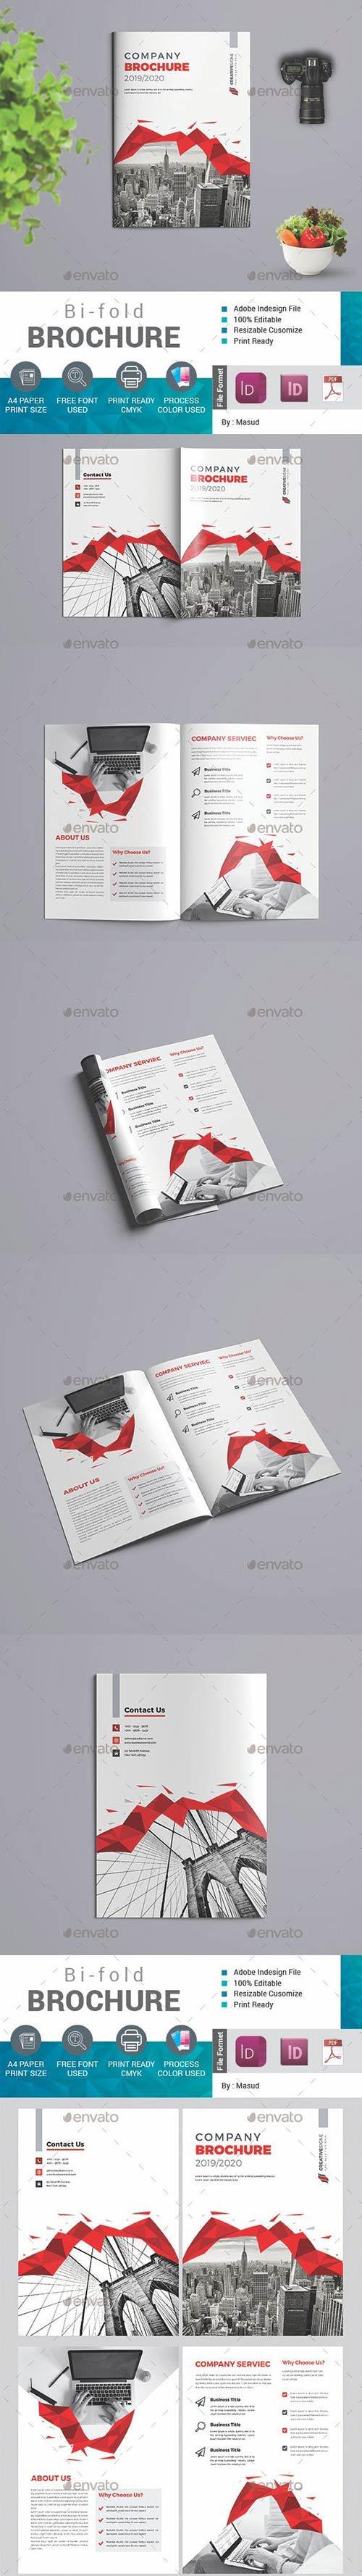 GraphicRiver - Bifold brochure 22652013